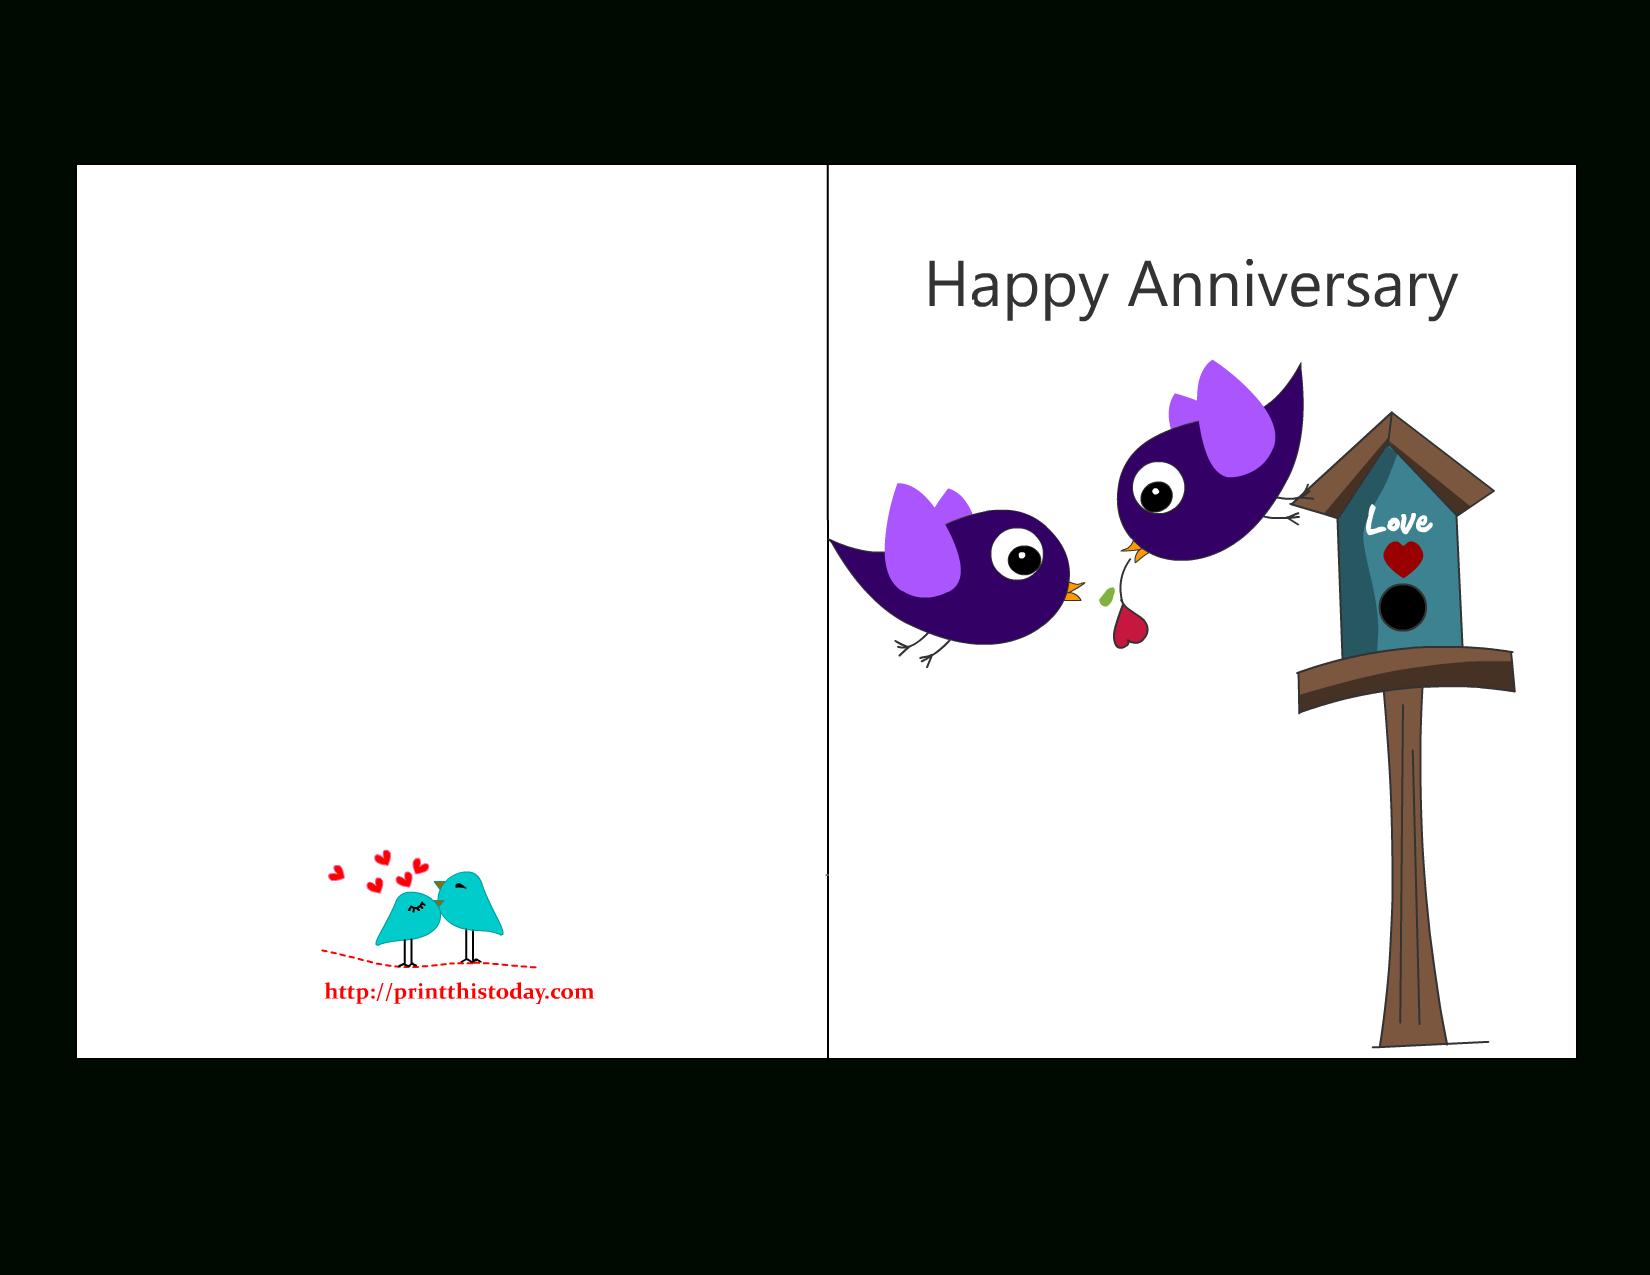 Free Anniversary Cards To Print | Free Printable Anniversary Cards - Free Printable Picture Cards